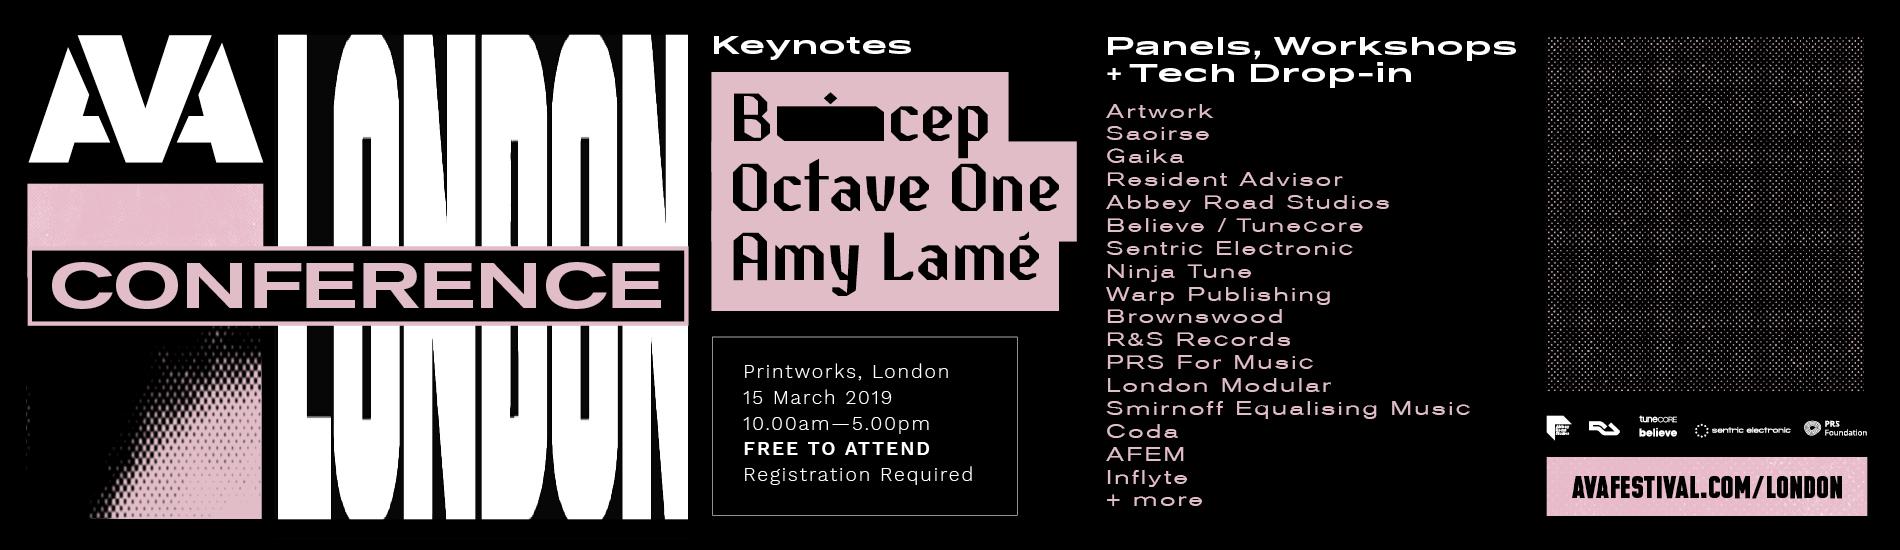 AVA London Conference